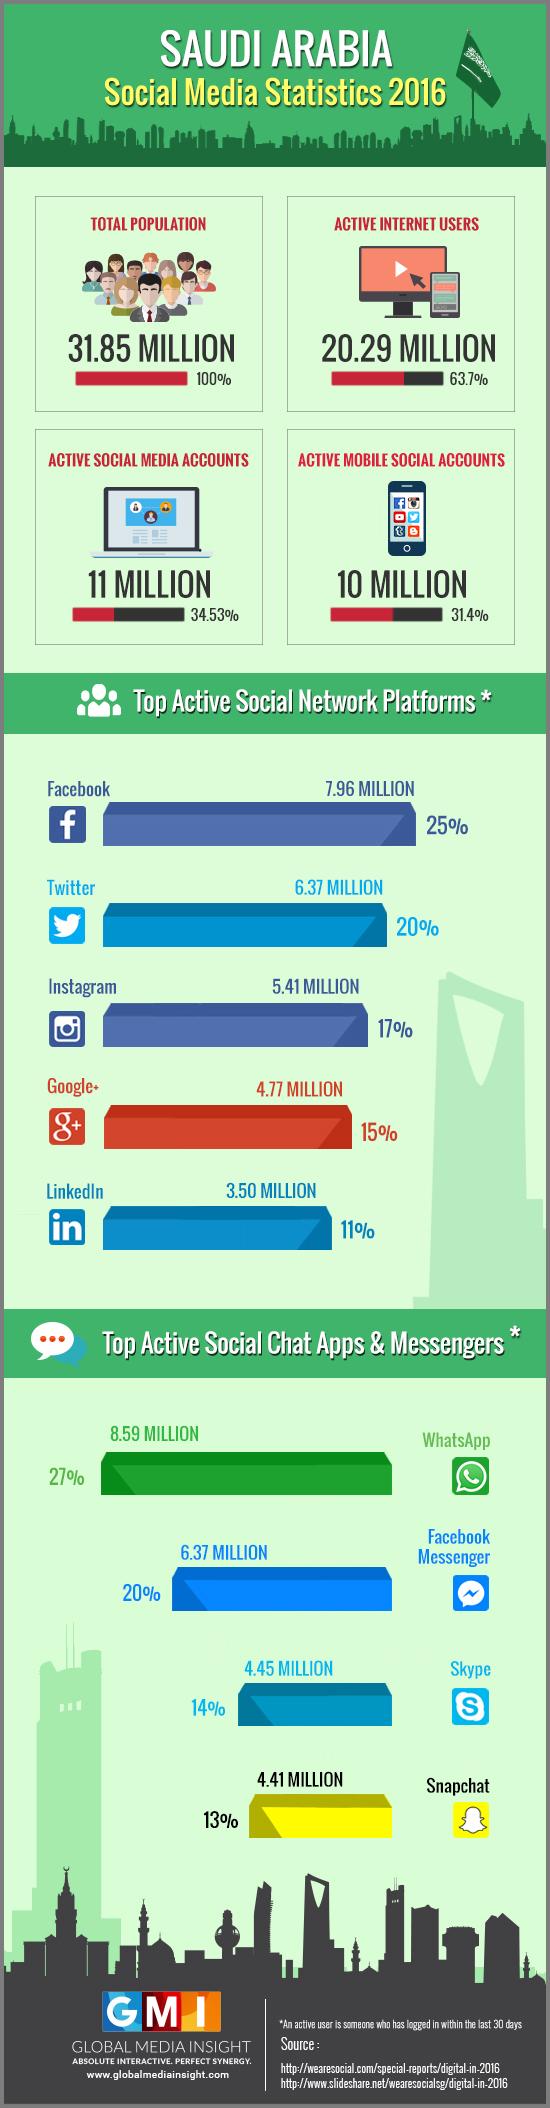 saudi-arabia-social-media-stats-2016-infographics